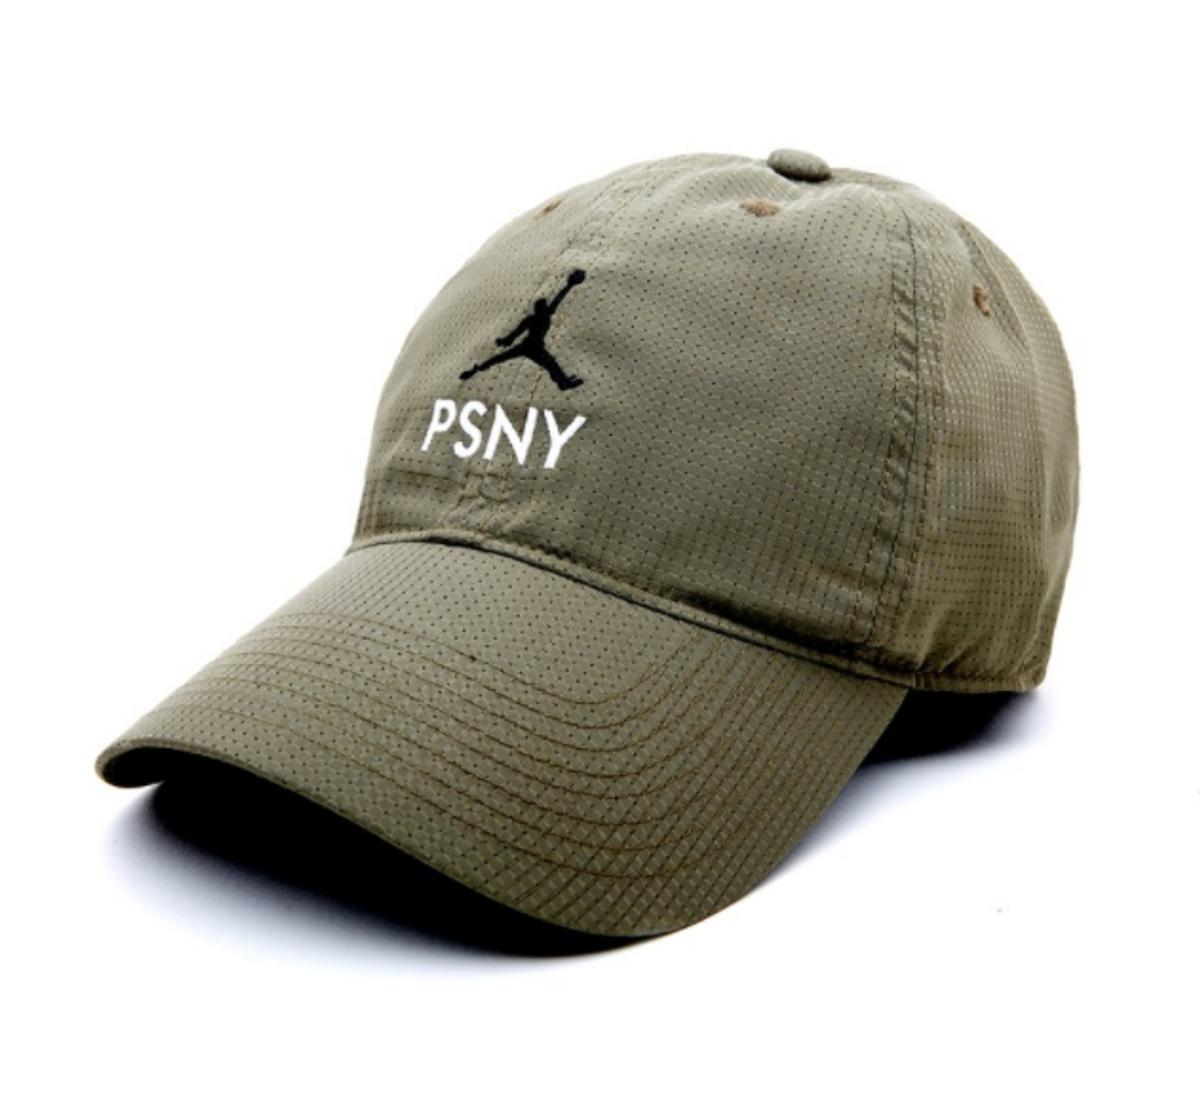 ef6e0640e56 Public School PSNY x JORDAN BRAND HAT Size one size - Hats for Sale -  Grailed